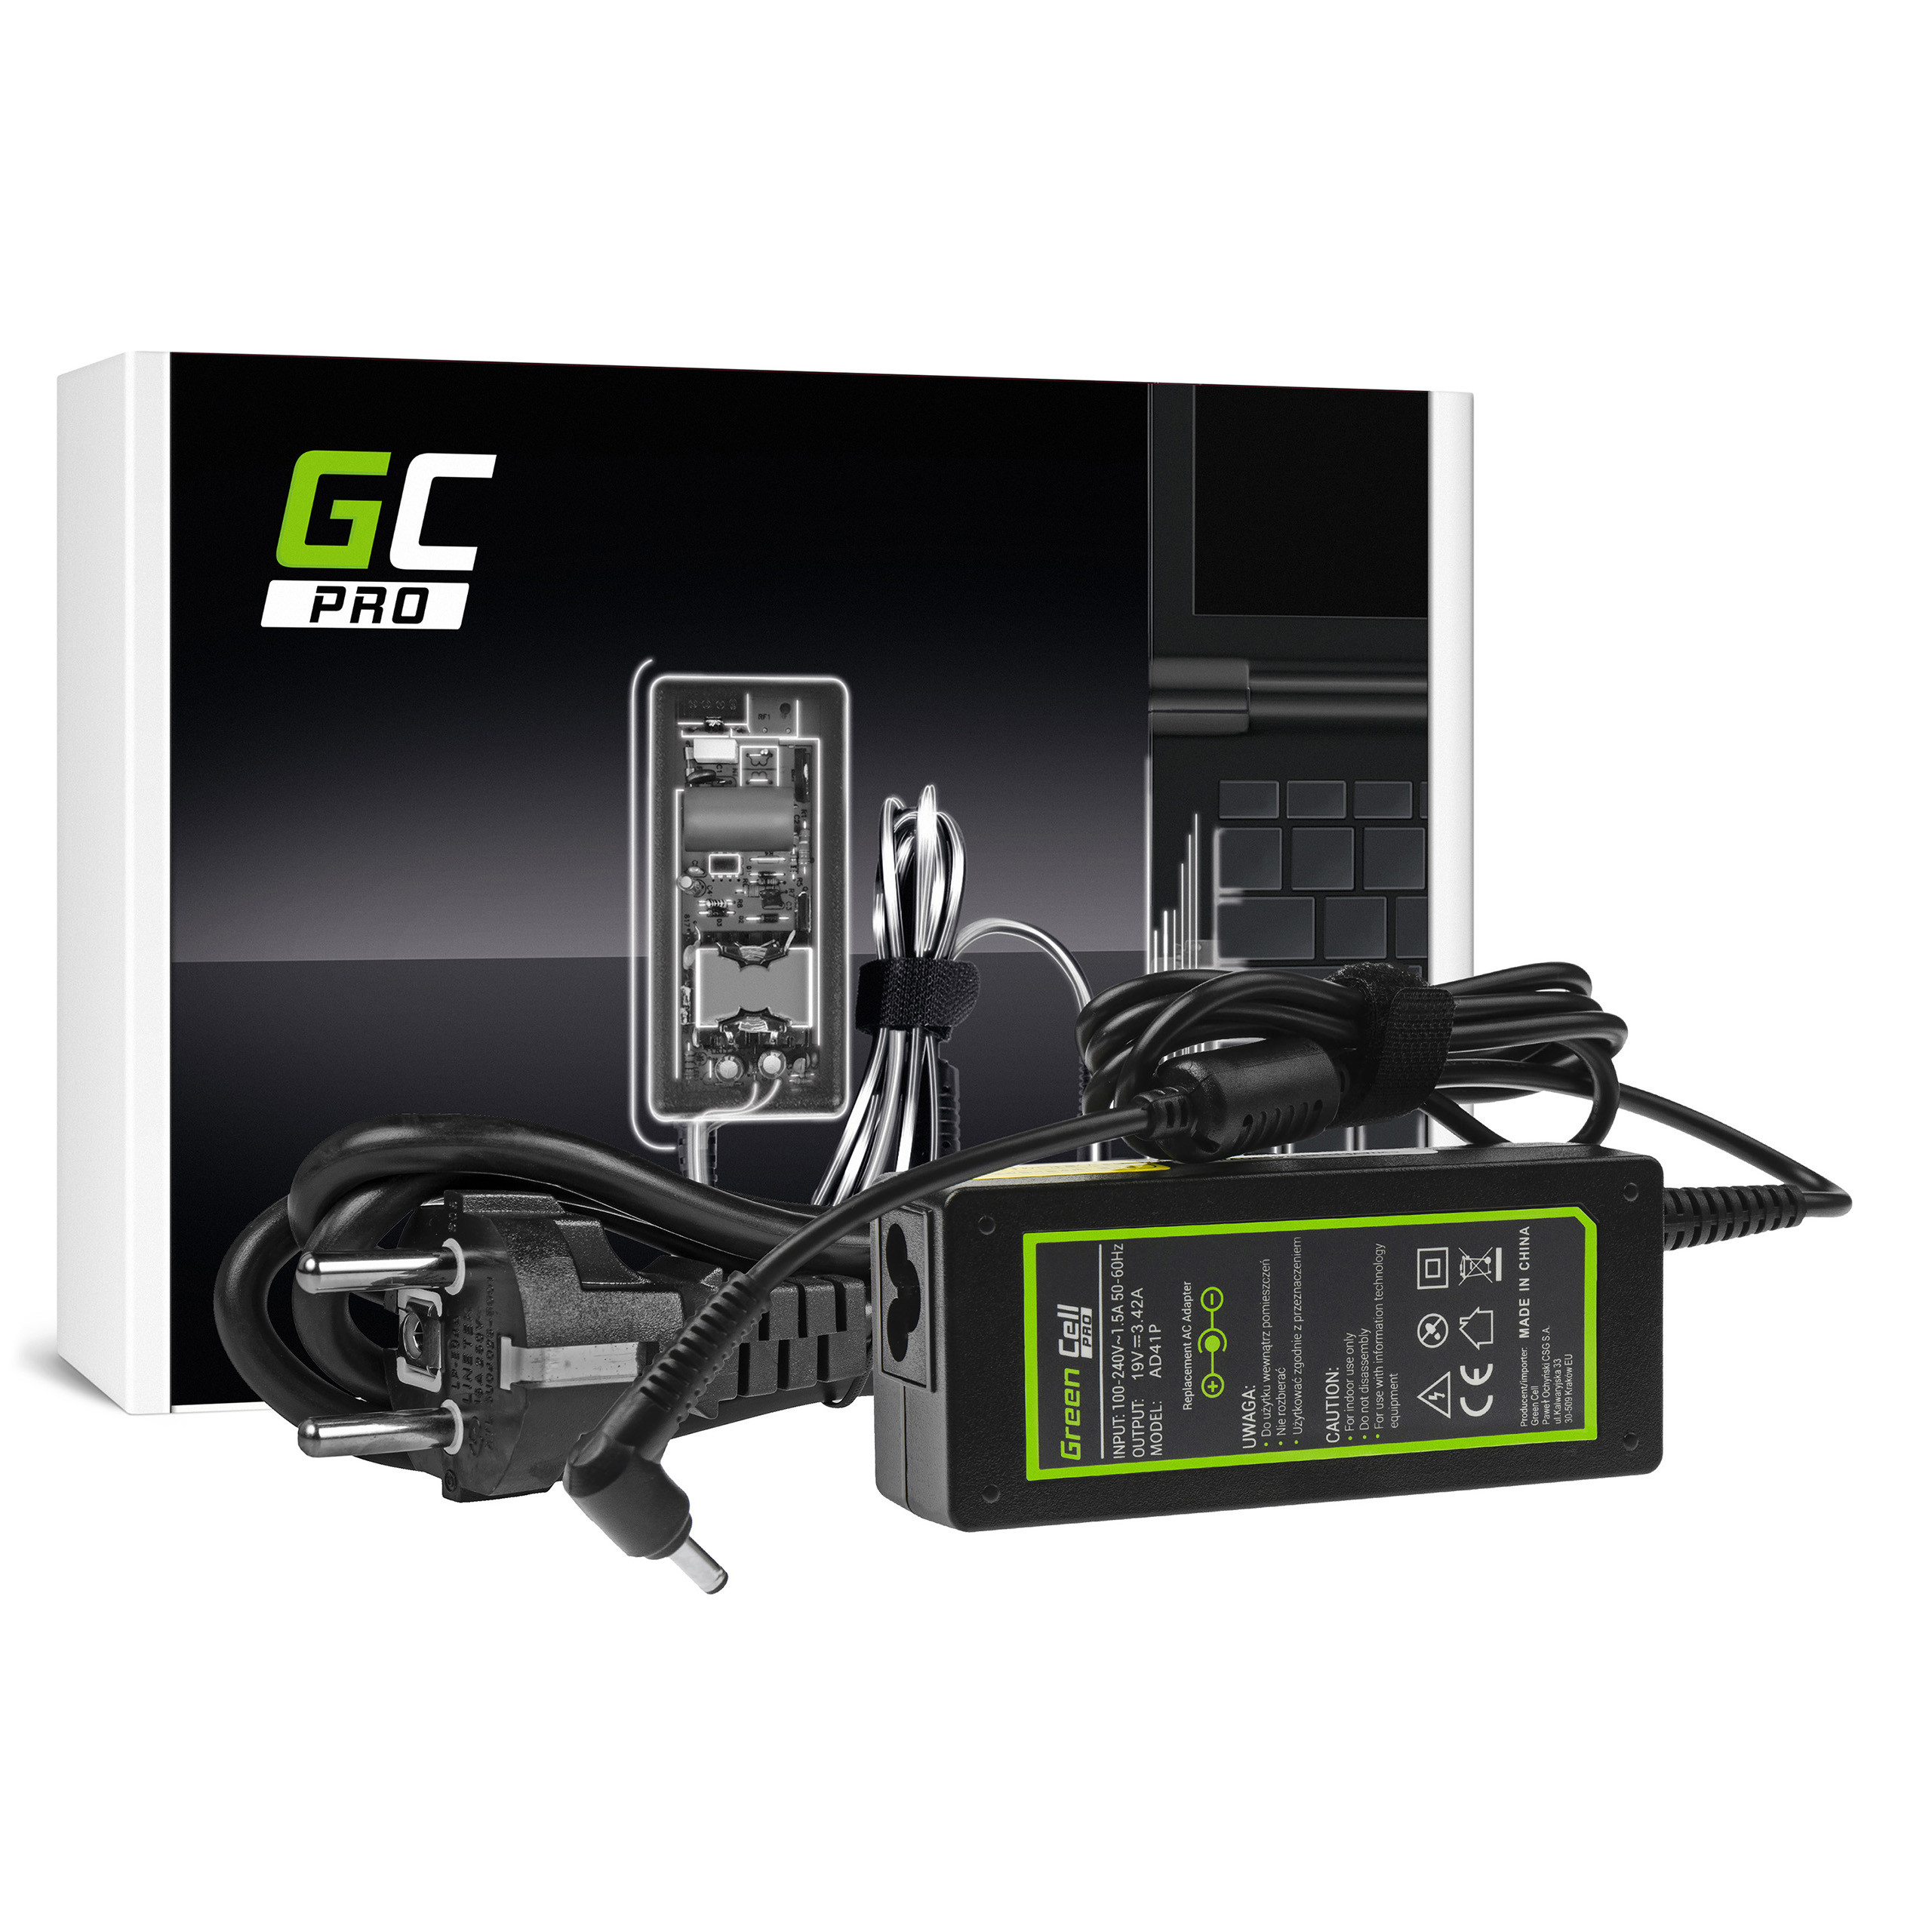 Green Cell AD41P Adaptér Nabíječka pro Asus Vivobook S200 Zenbook UX21 UX32 | 19V | 3.42A | 65W | konektor 4.0mm-1.35mm